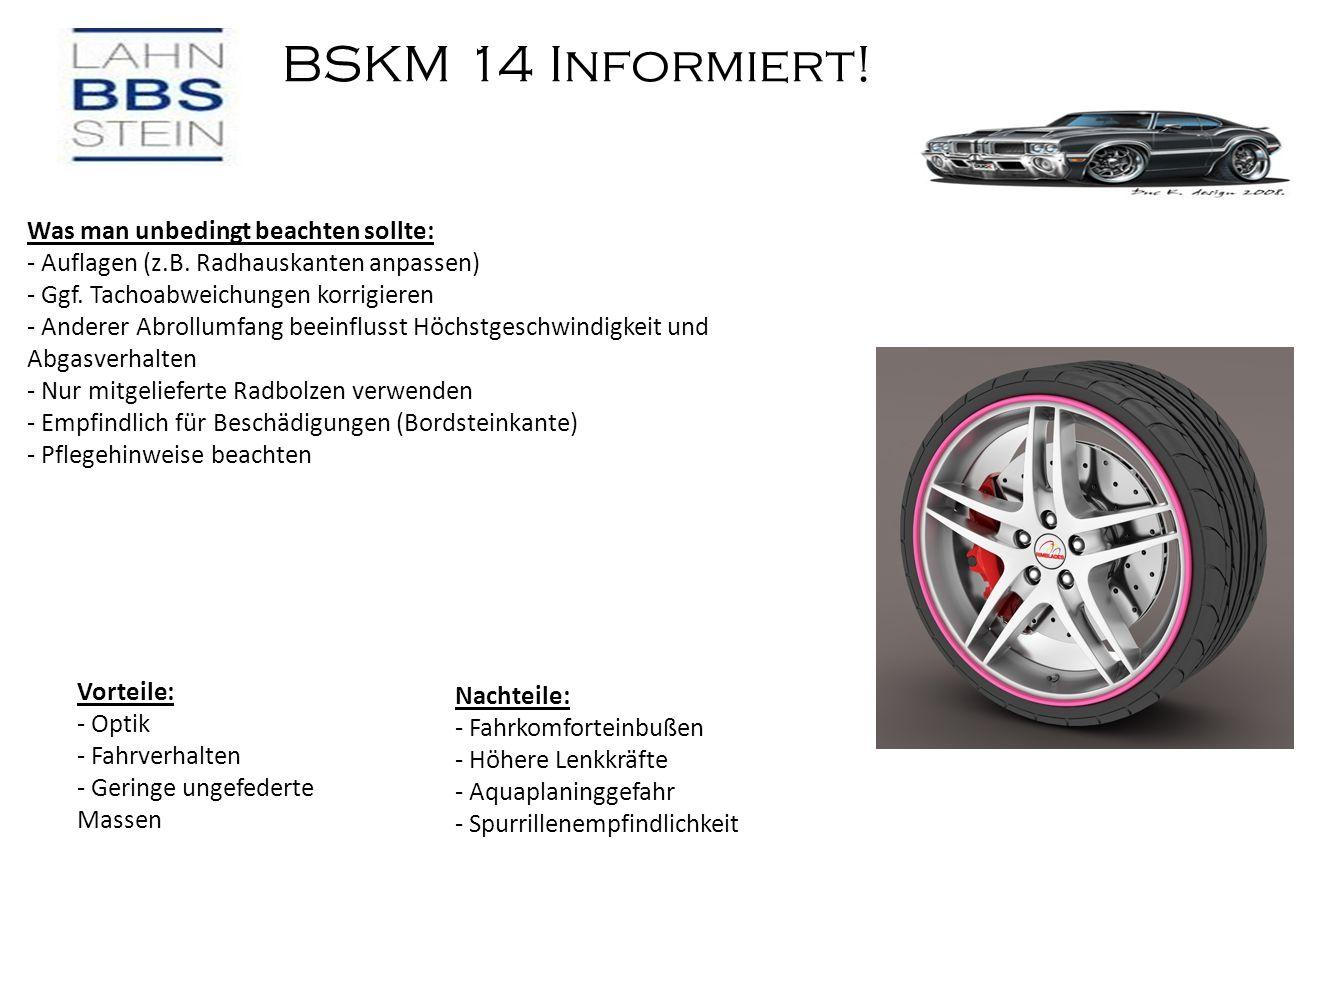 BSKM 14 Informiert! Was man unbedingt beachten sollte: - Auflagen (z.B. Radhauskanten anpassen) - Ggf. Tachoabweichungen korrigieren - Anderer Abrollu